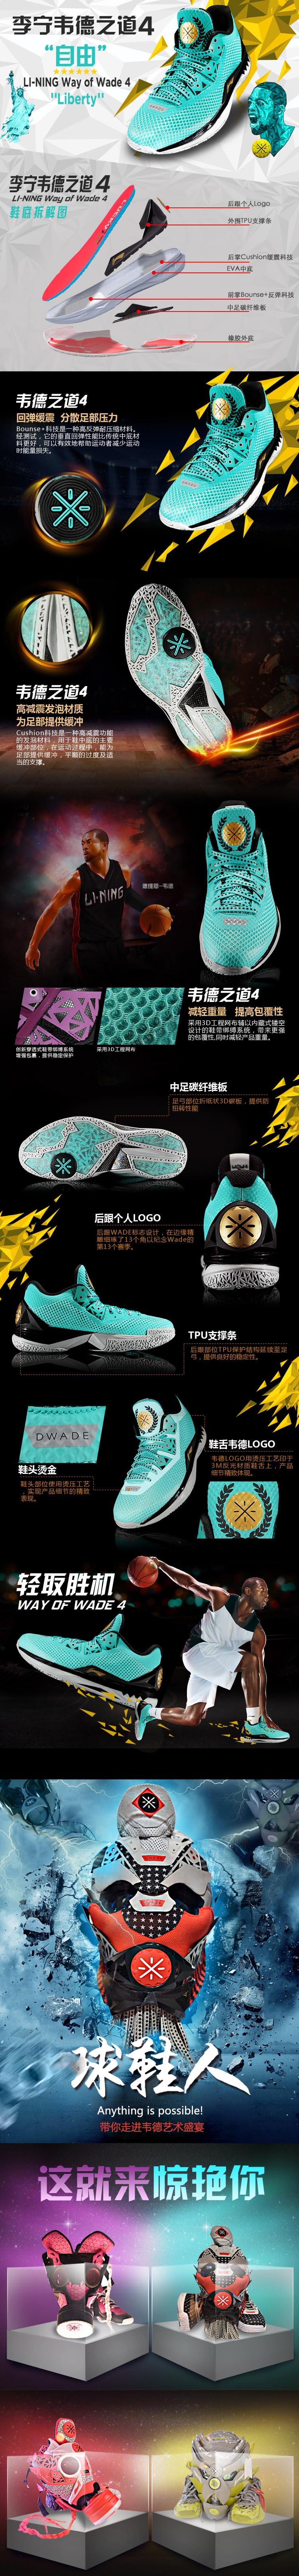 "Li-Ning WoW4 Way of Wade 4 ""Liberty"" Premium Basketball Shoes"